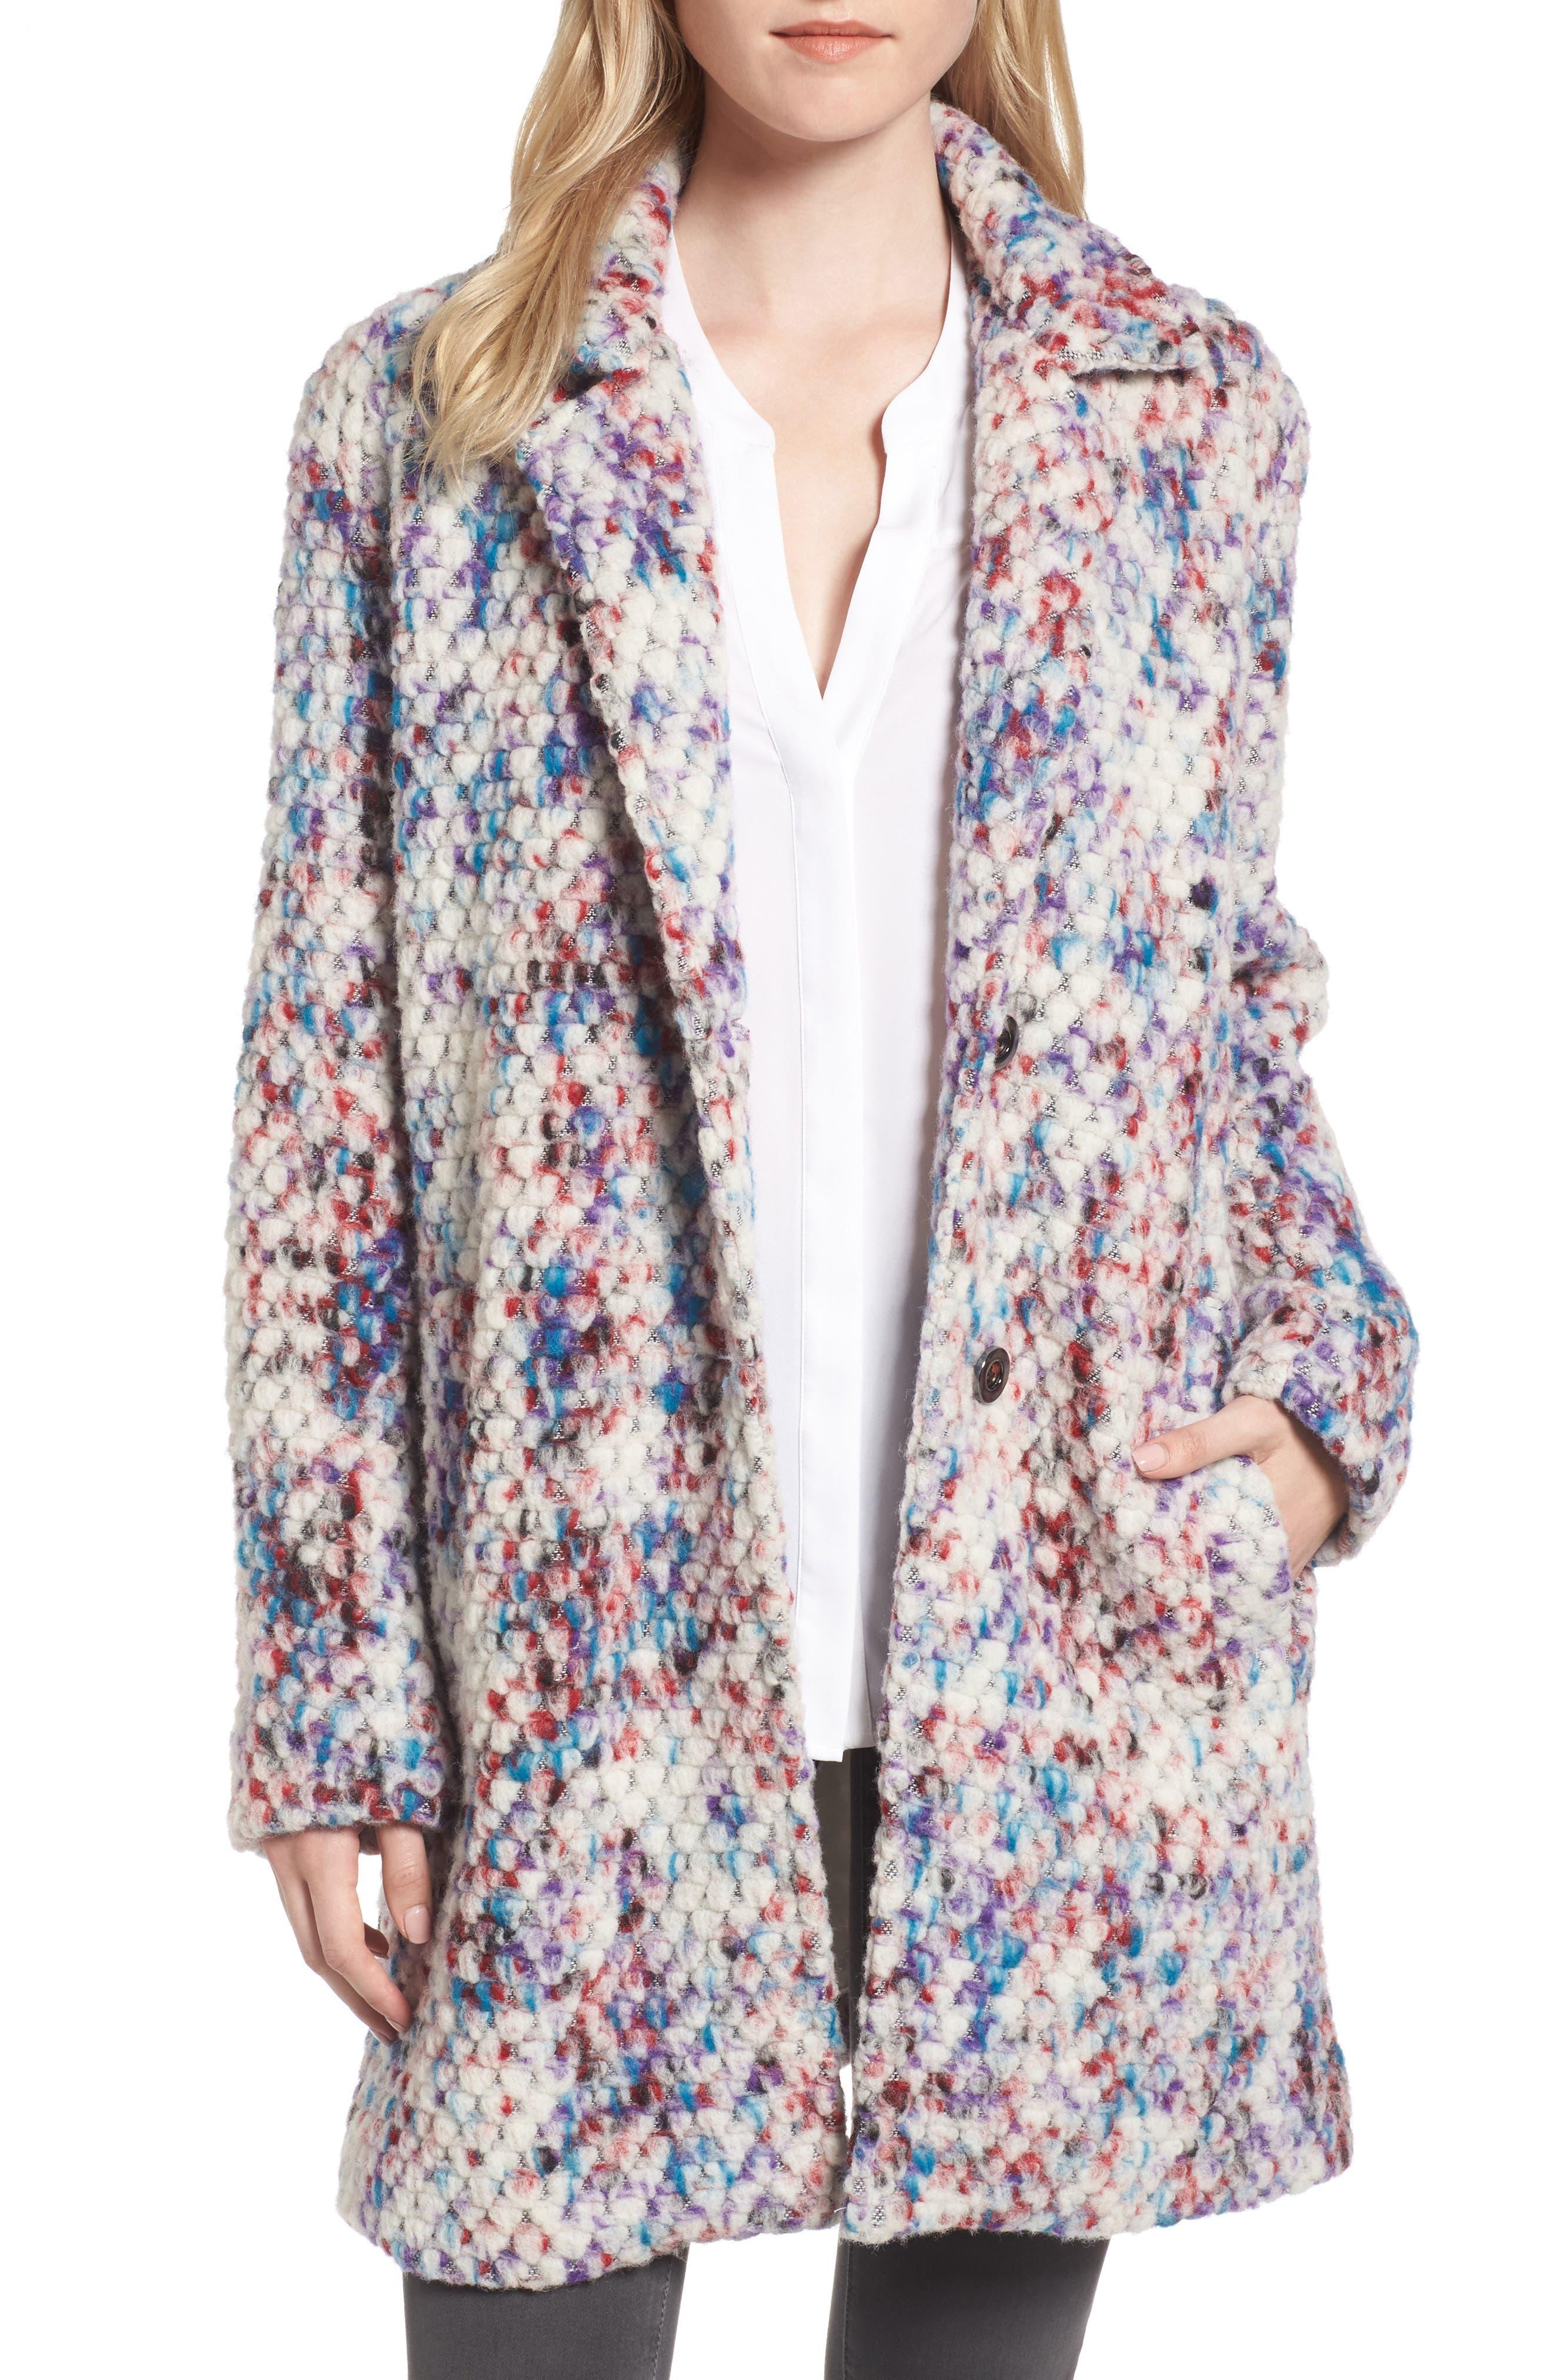 Confetti Wool Blend Coat,                         Main,                         color, Multi